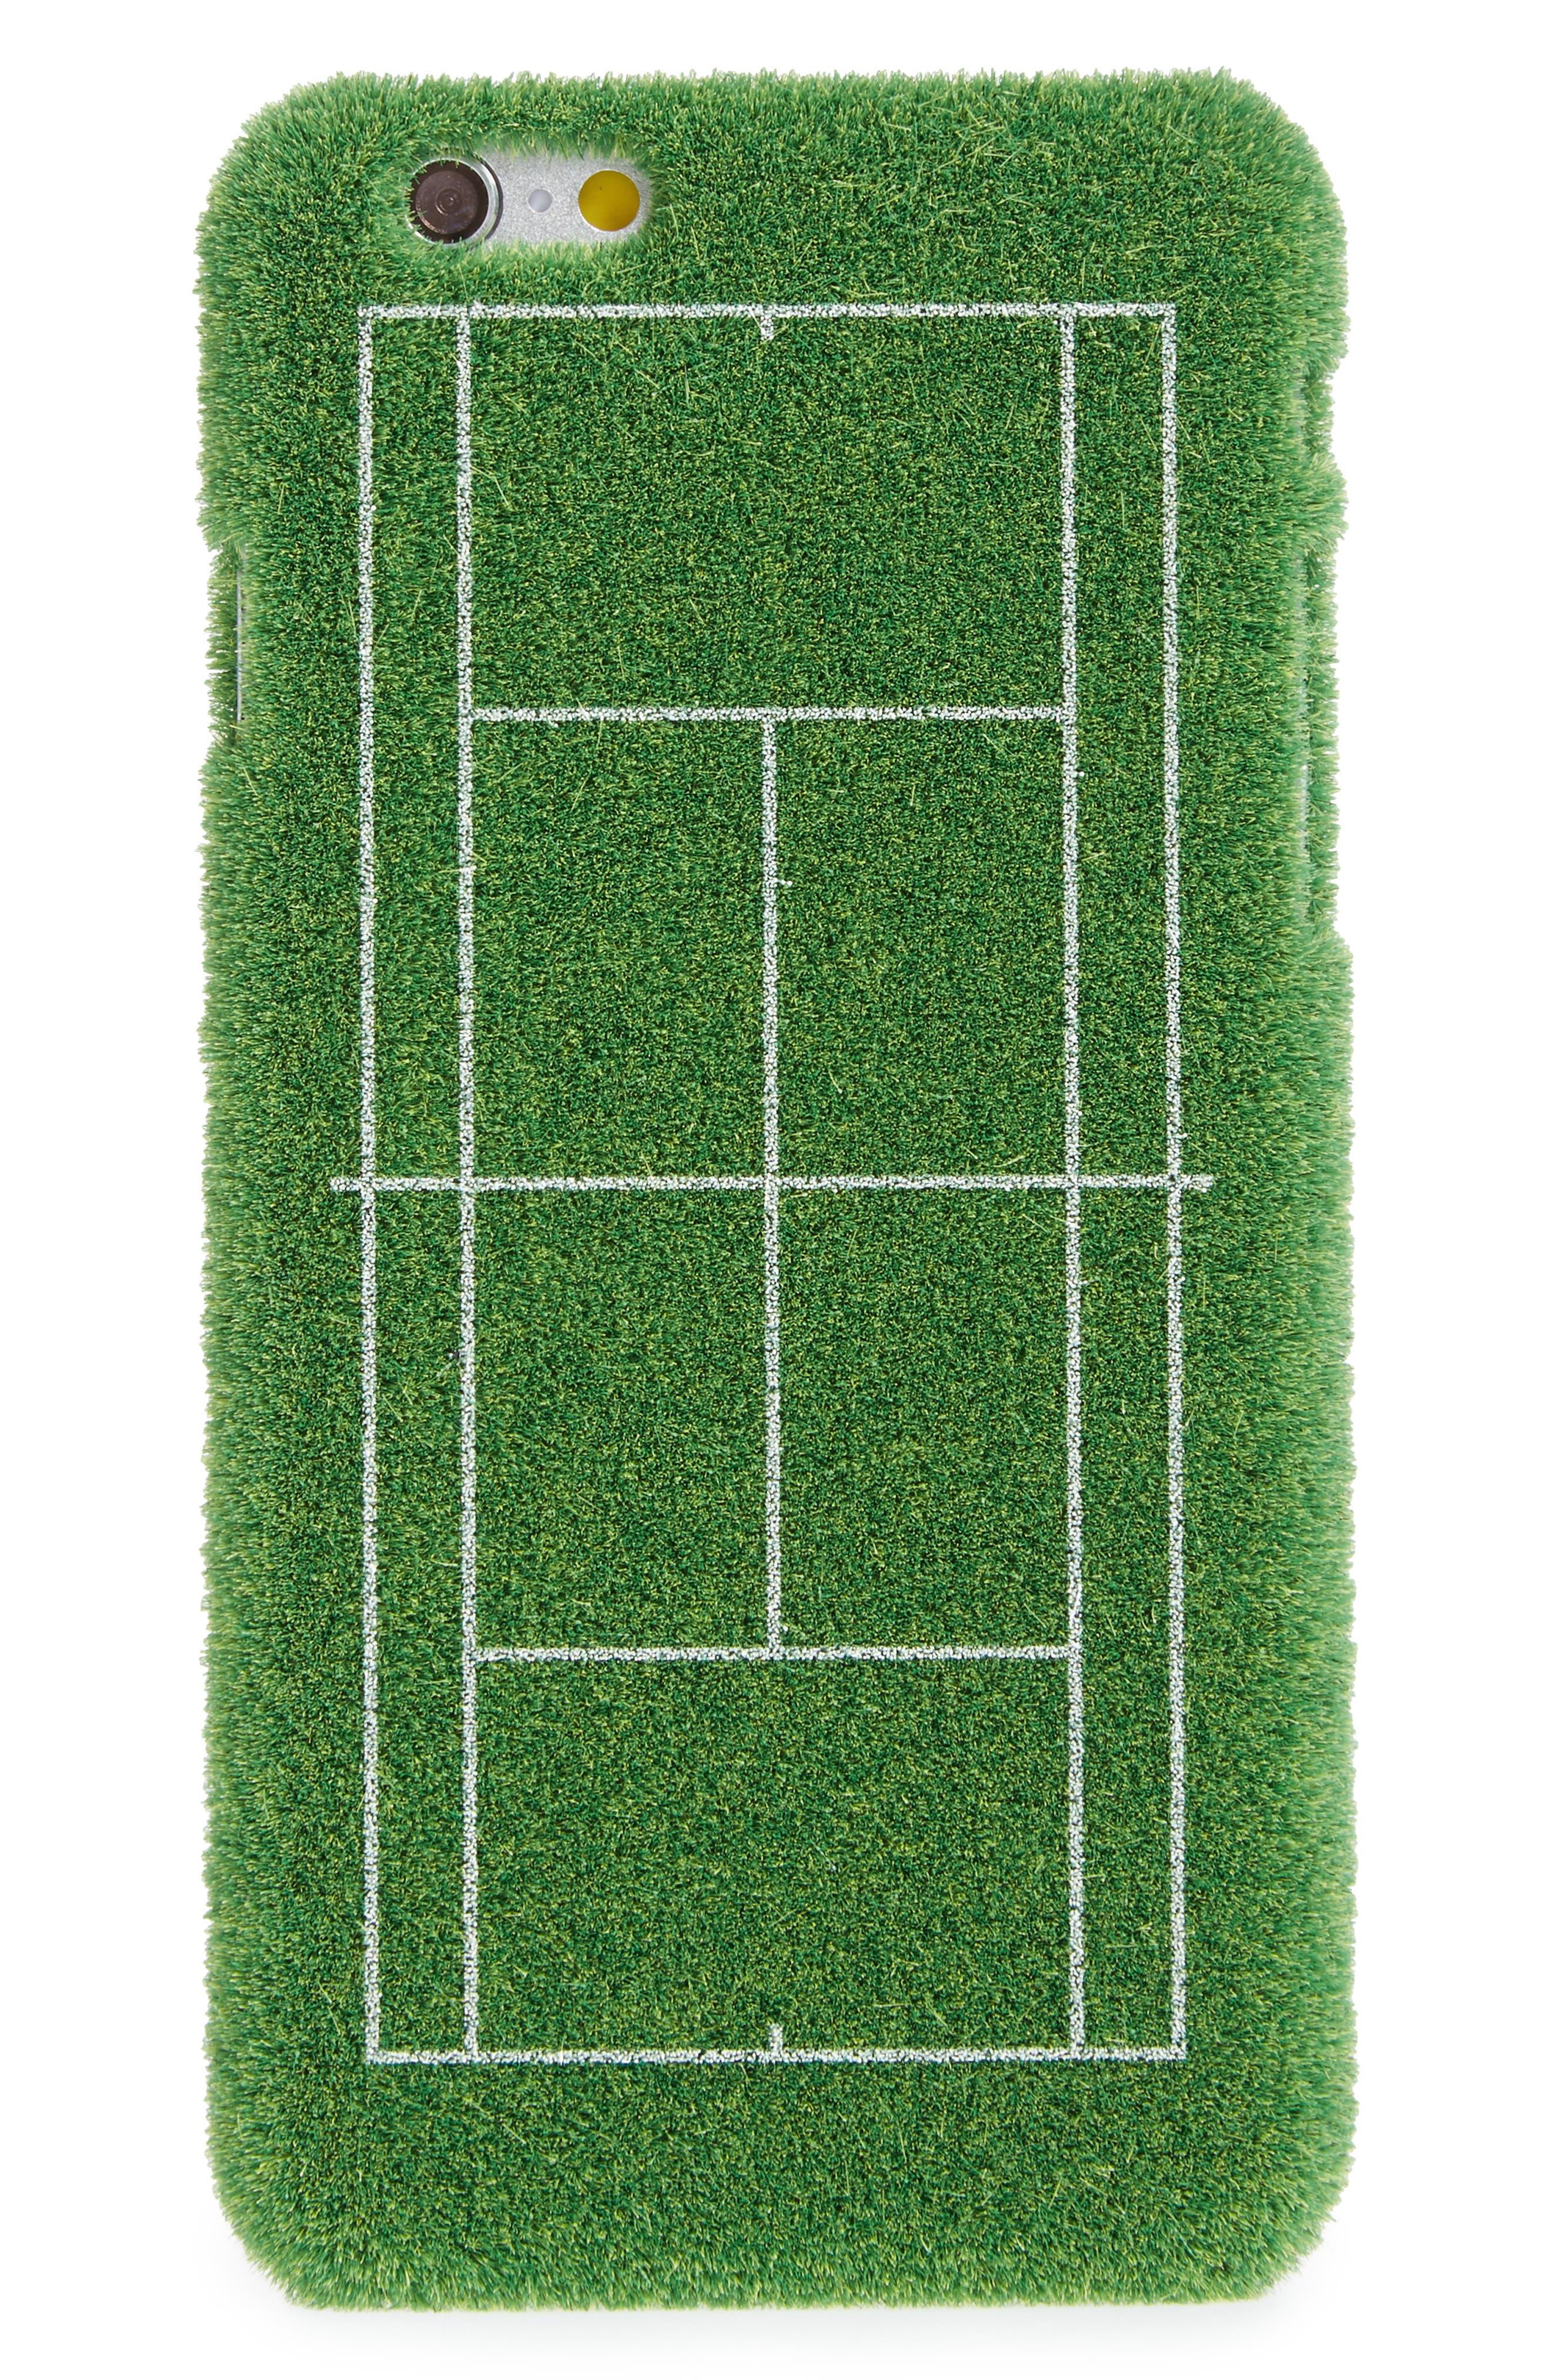 Grand Slam Portable Park iPhone 6/6s & 6/6s Plus Case,                             Alternate thumbnail 3, color,                             GREEN